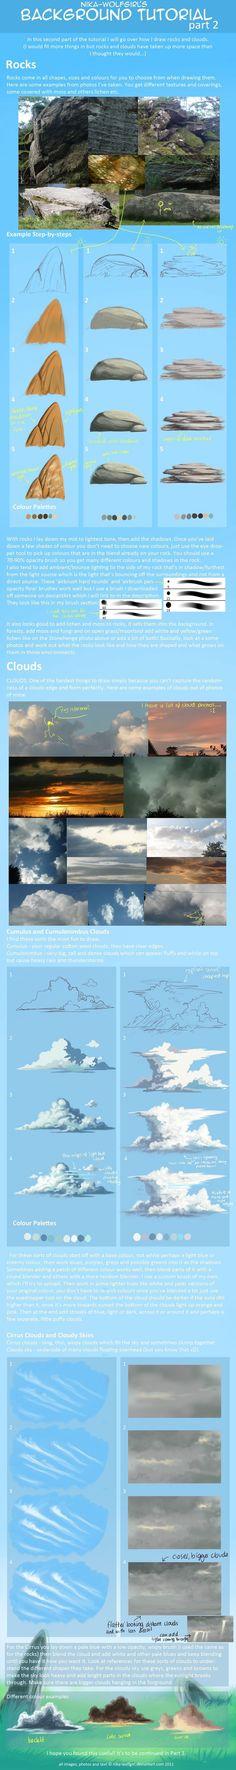 Rochas e nuvens